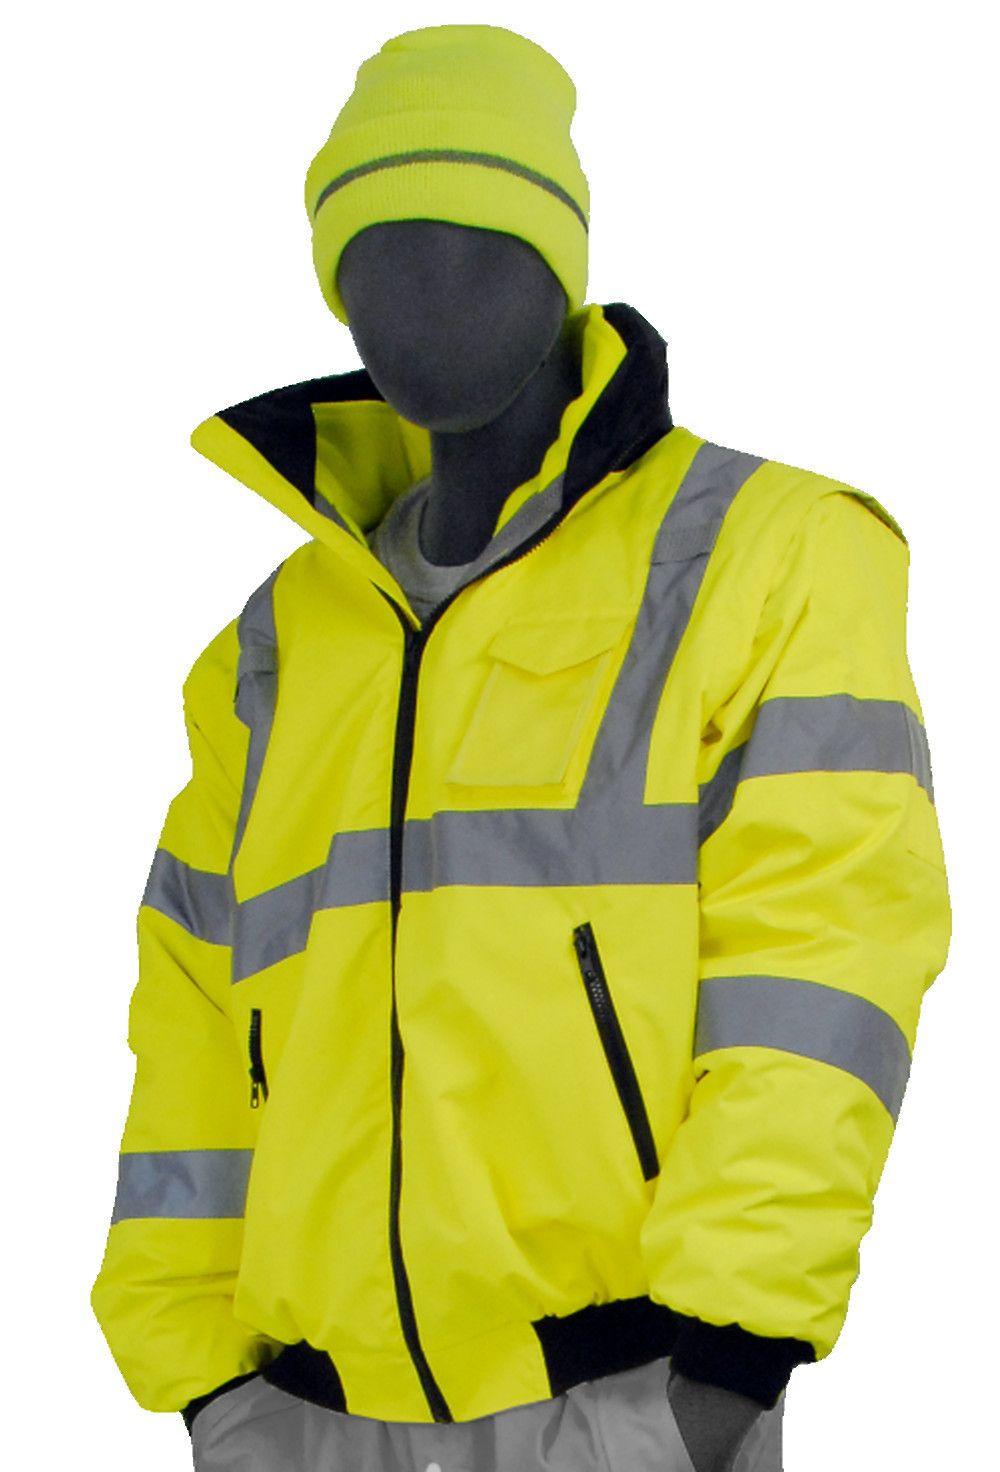 Majestic 751381 hi vis yellow transformer bomber jacket